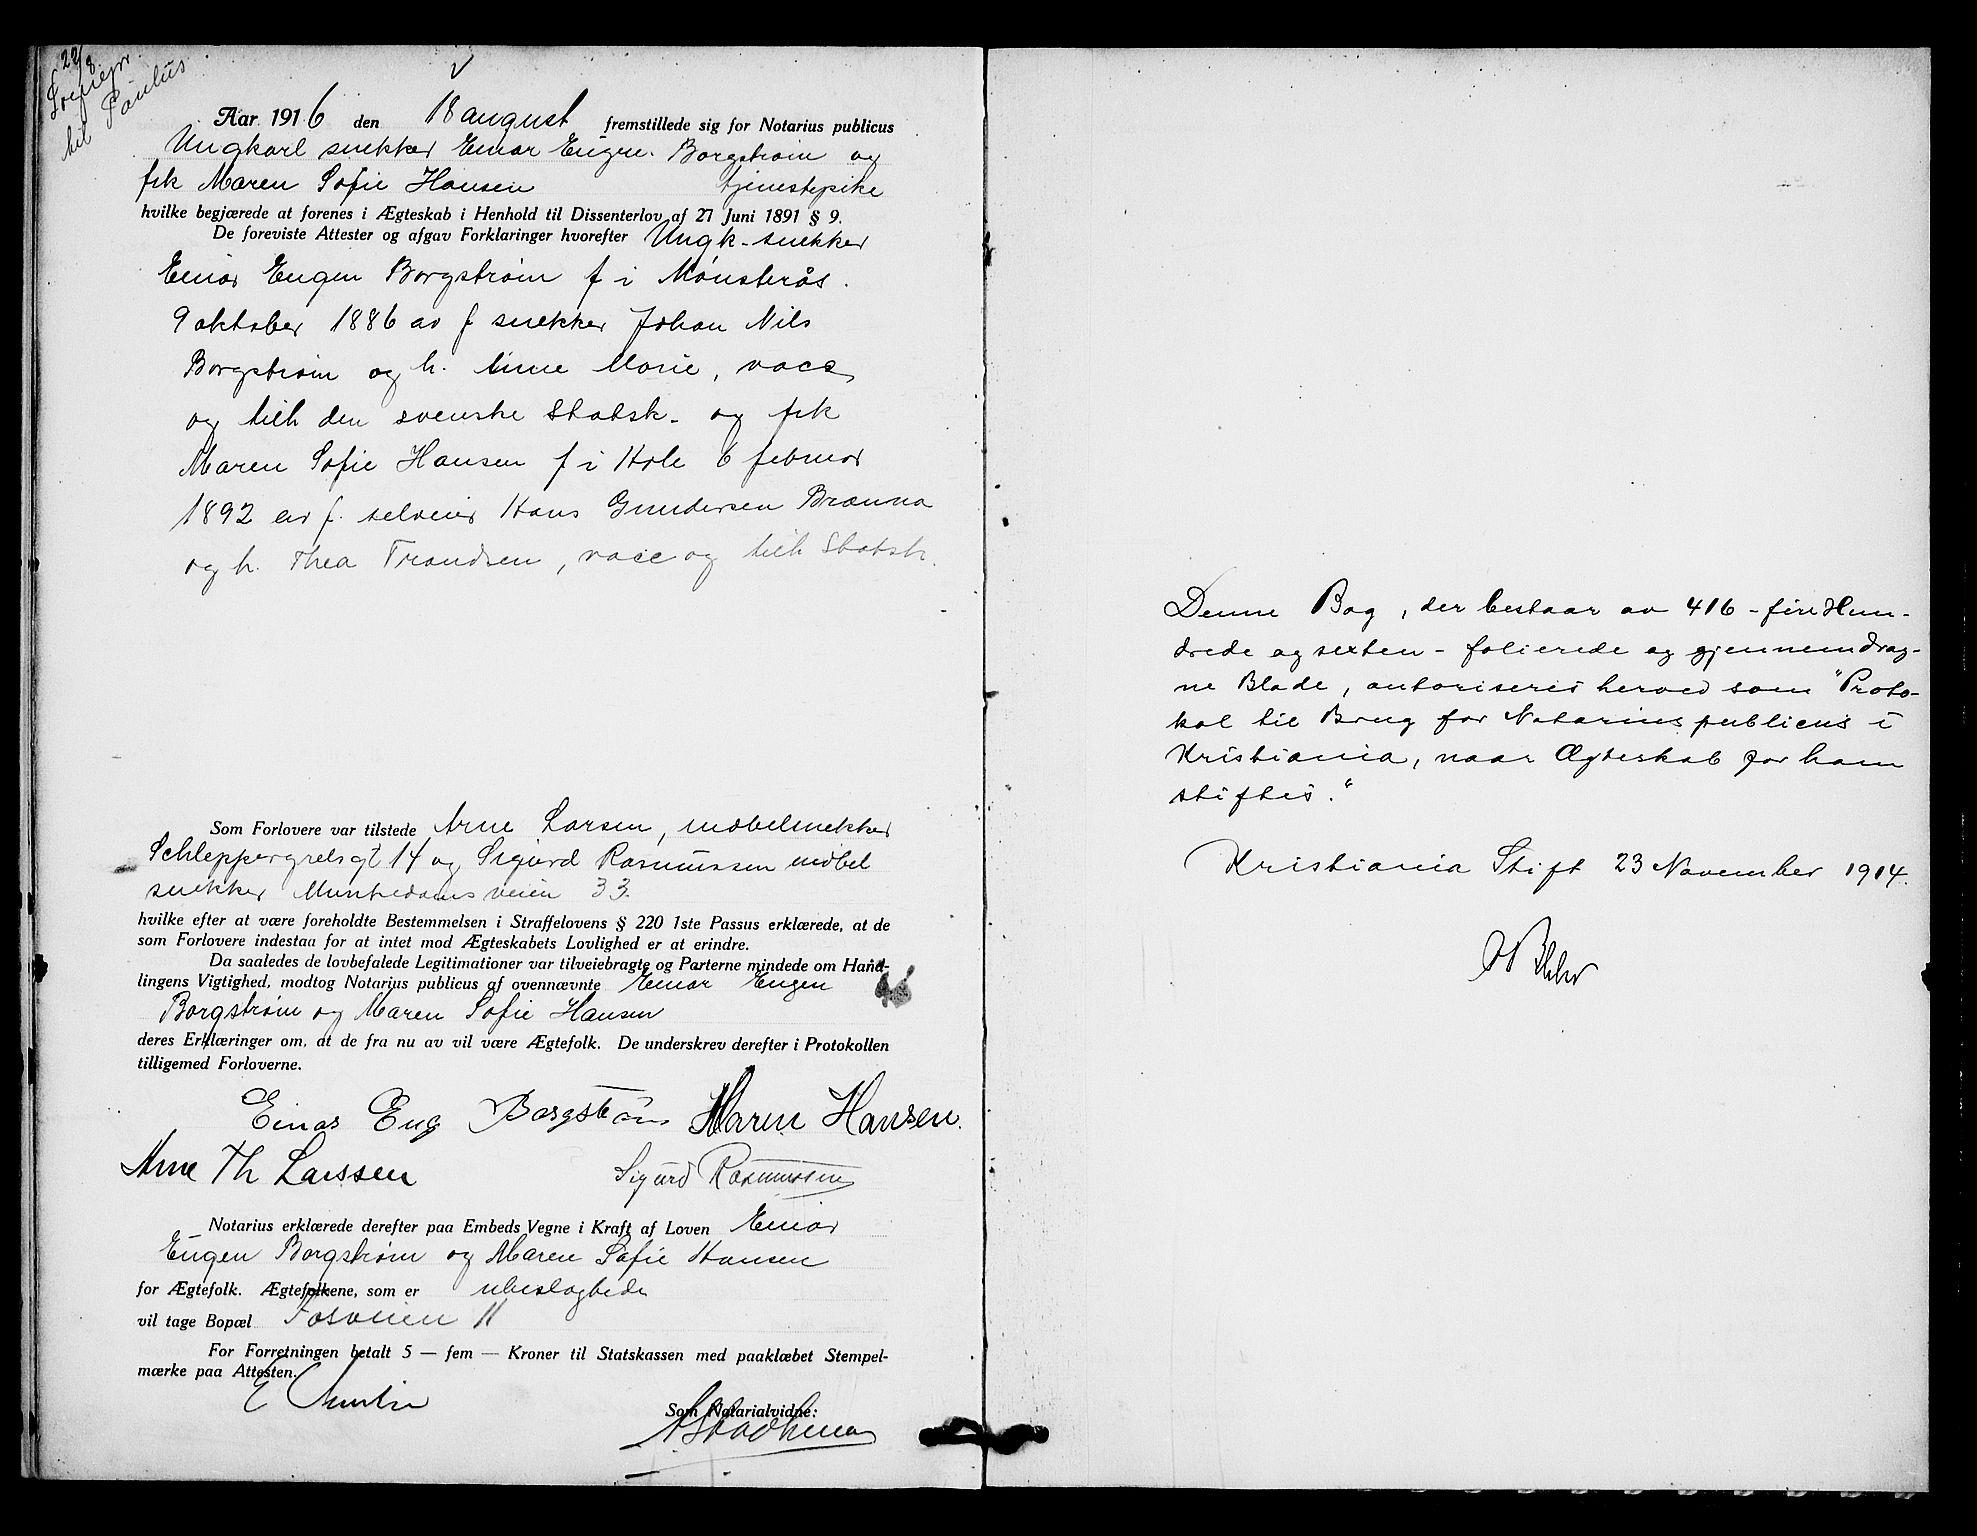 SAO, Oslo byfogd avd. I, L/Lb/Lbb/L0010: Notarialprotokoll, rekke II: Vigsler, 1914-1916, s. 516b